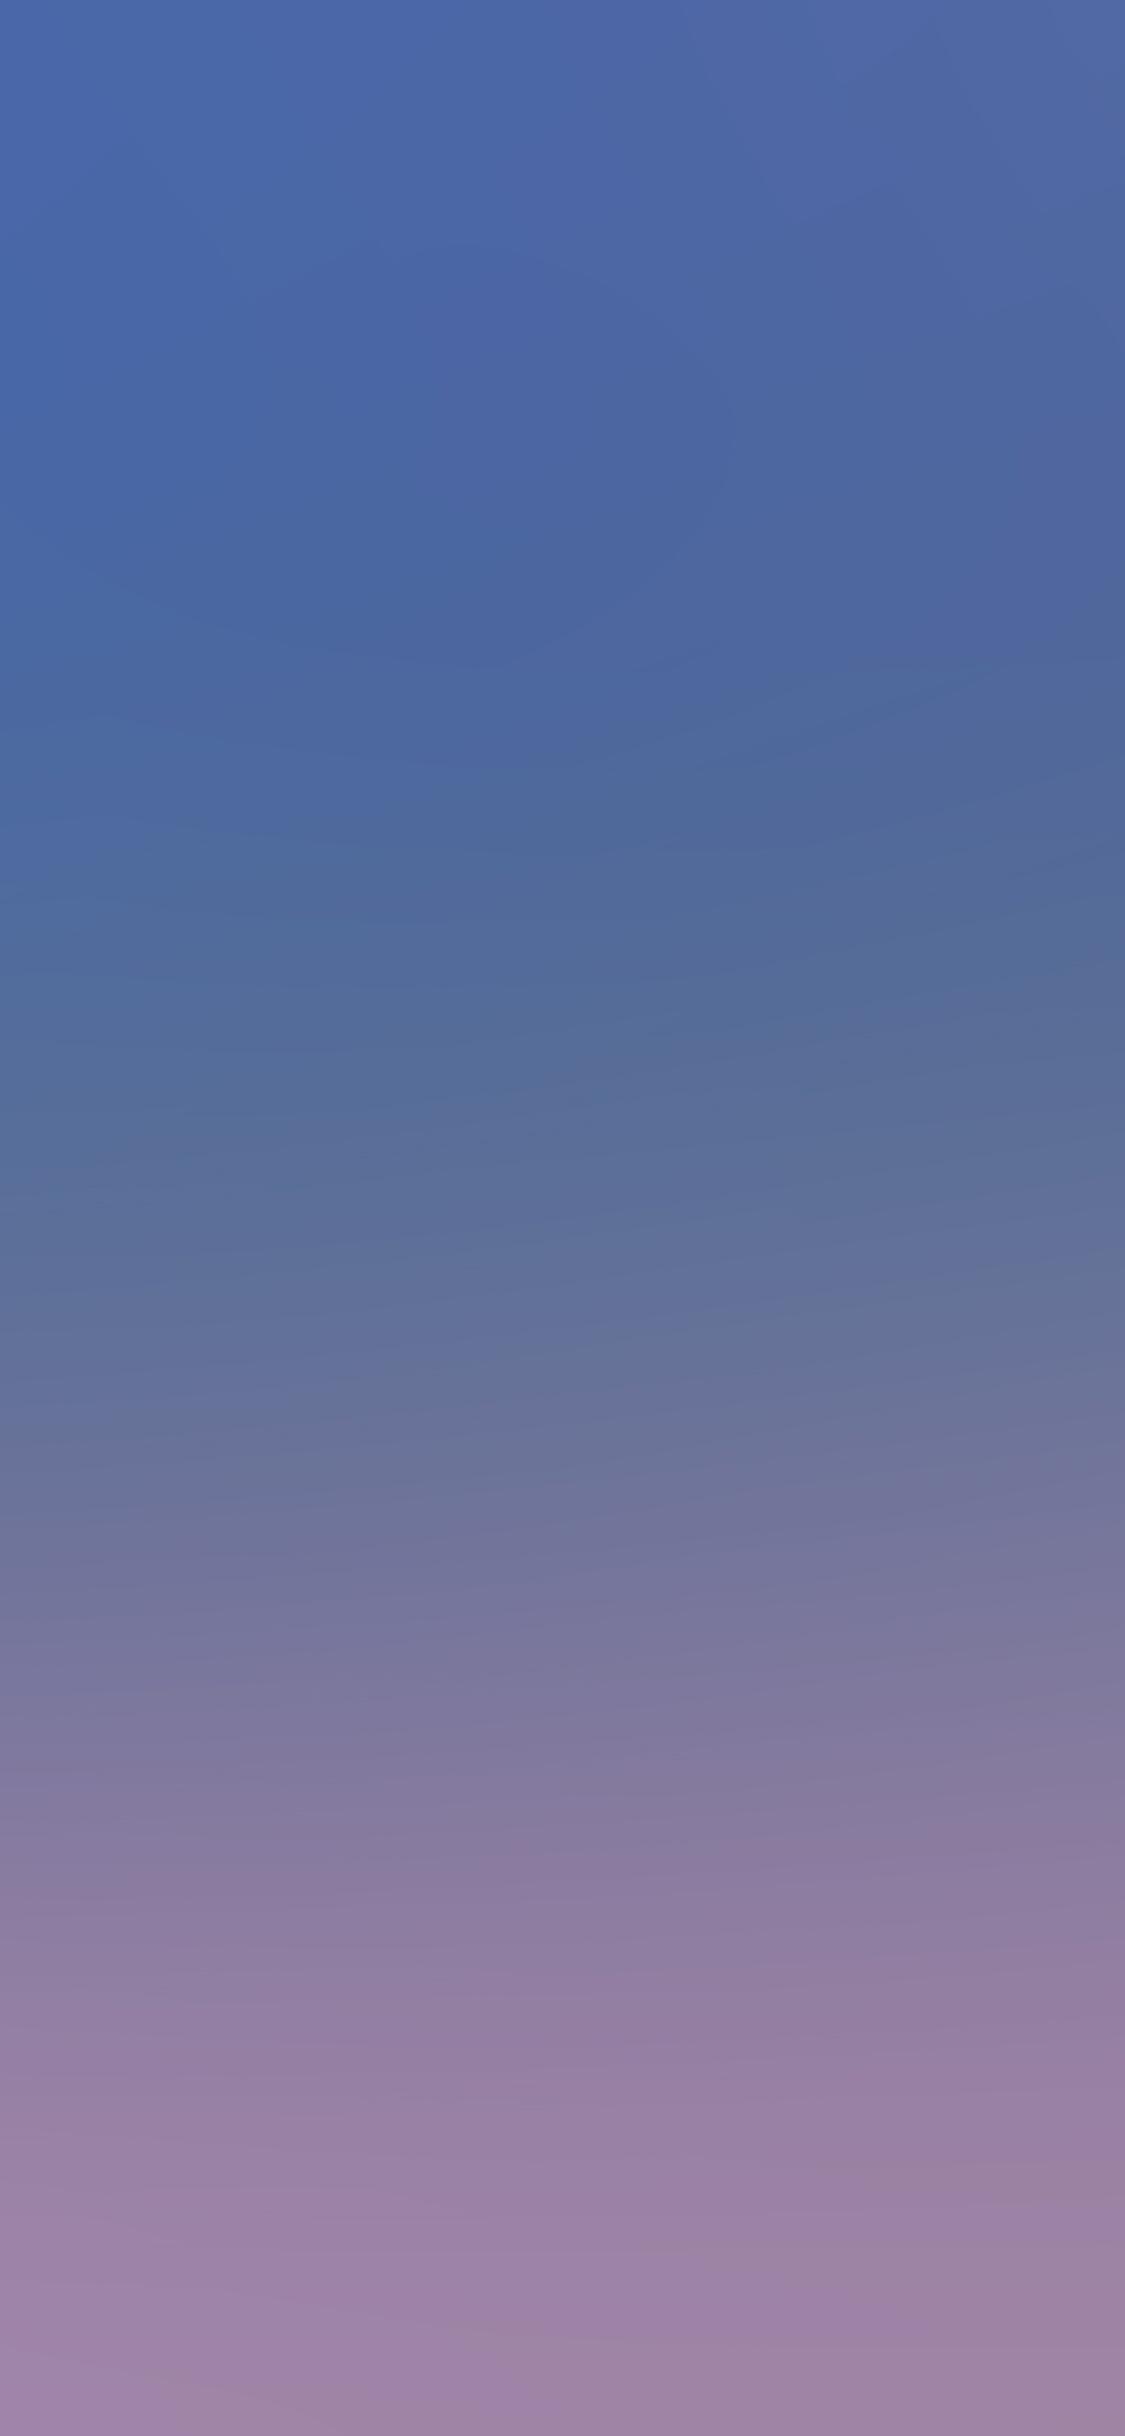 Iphonexpapers Com Iphone X Wallpaper Sj53 Blue Purple Soft Light Gradation Blur